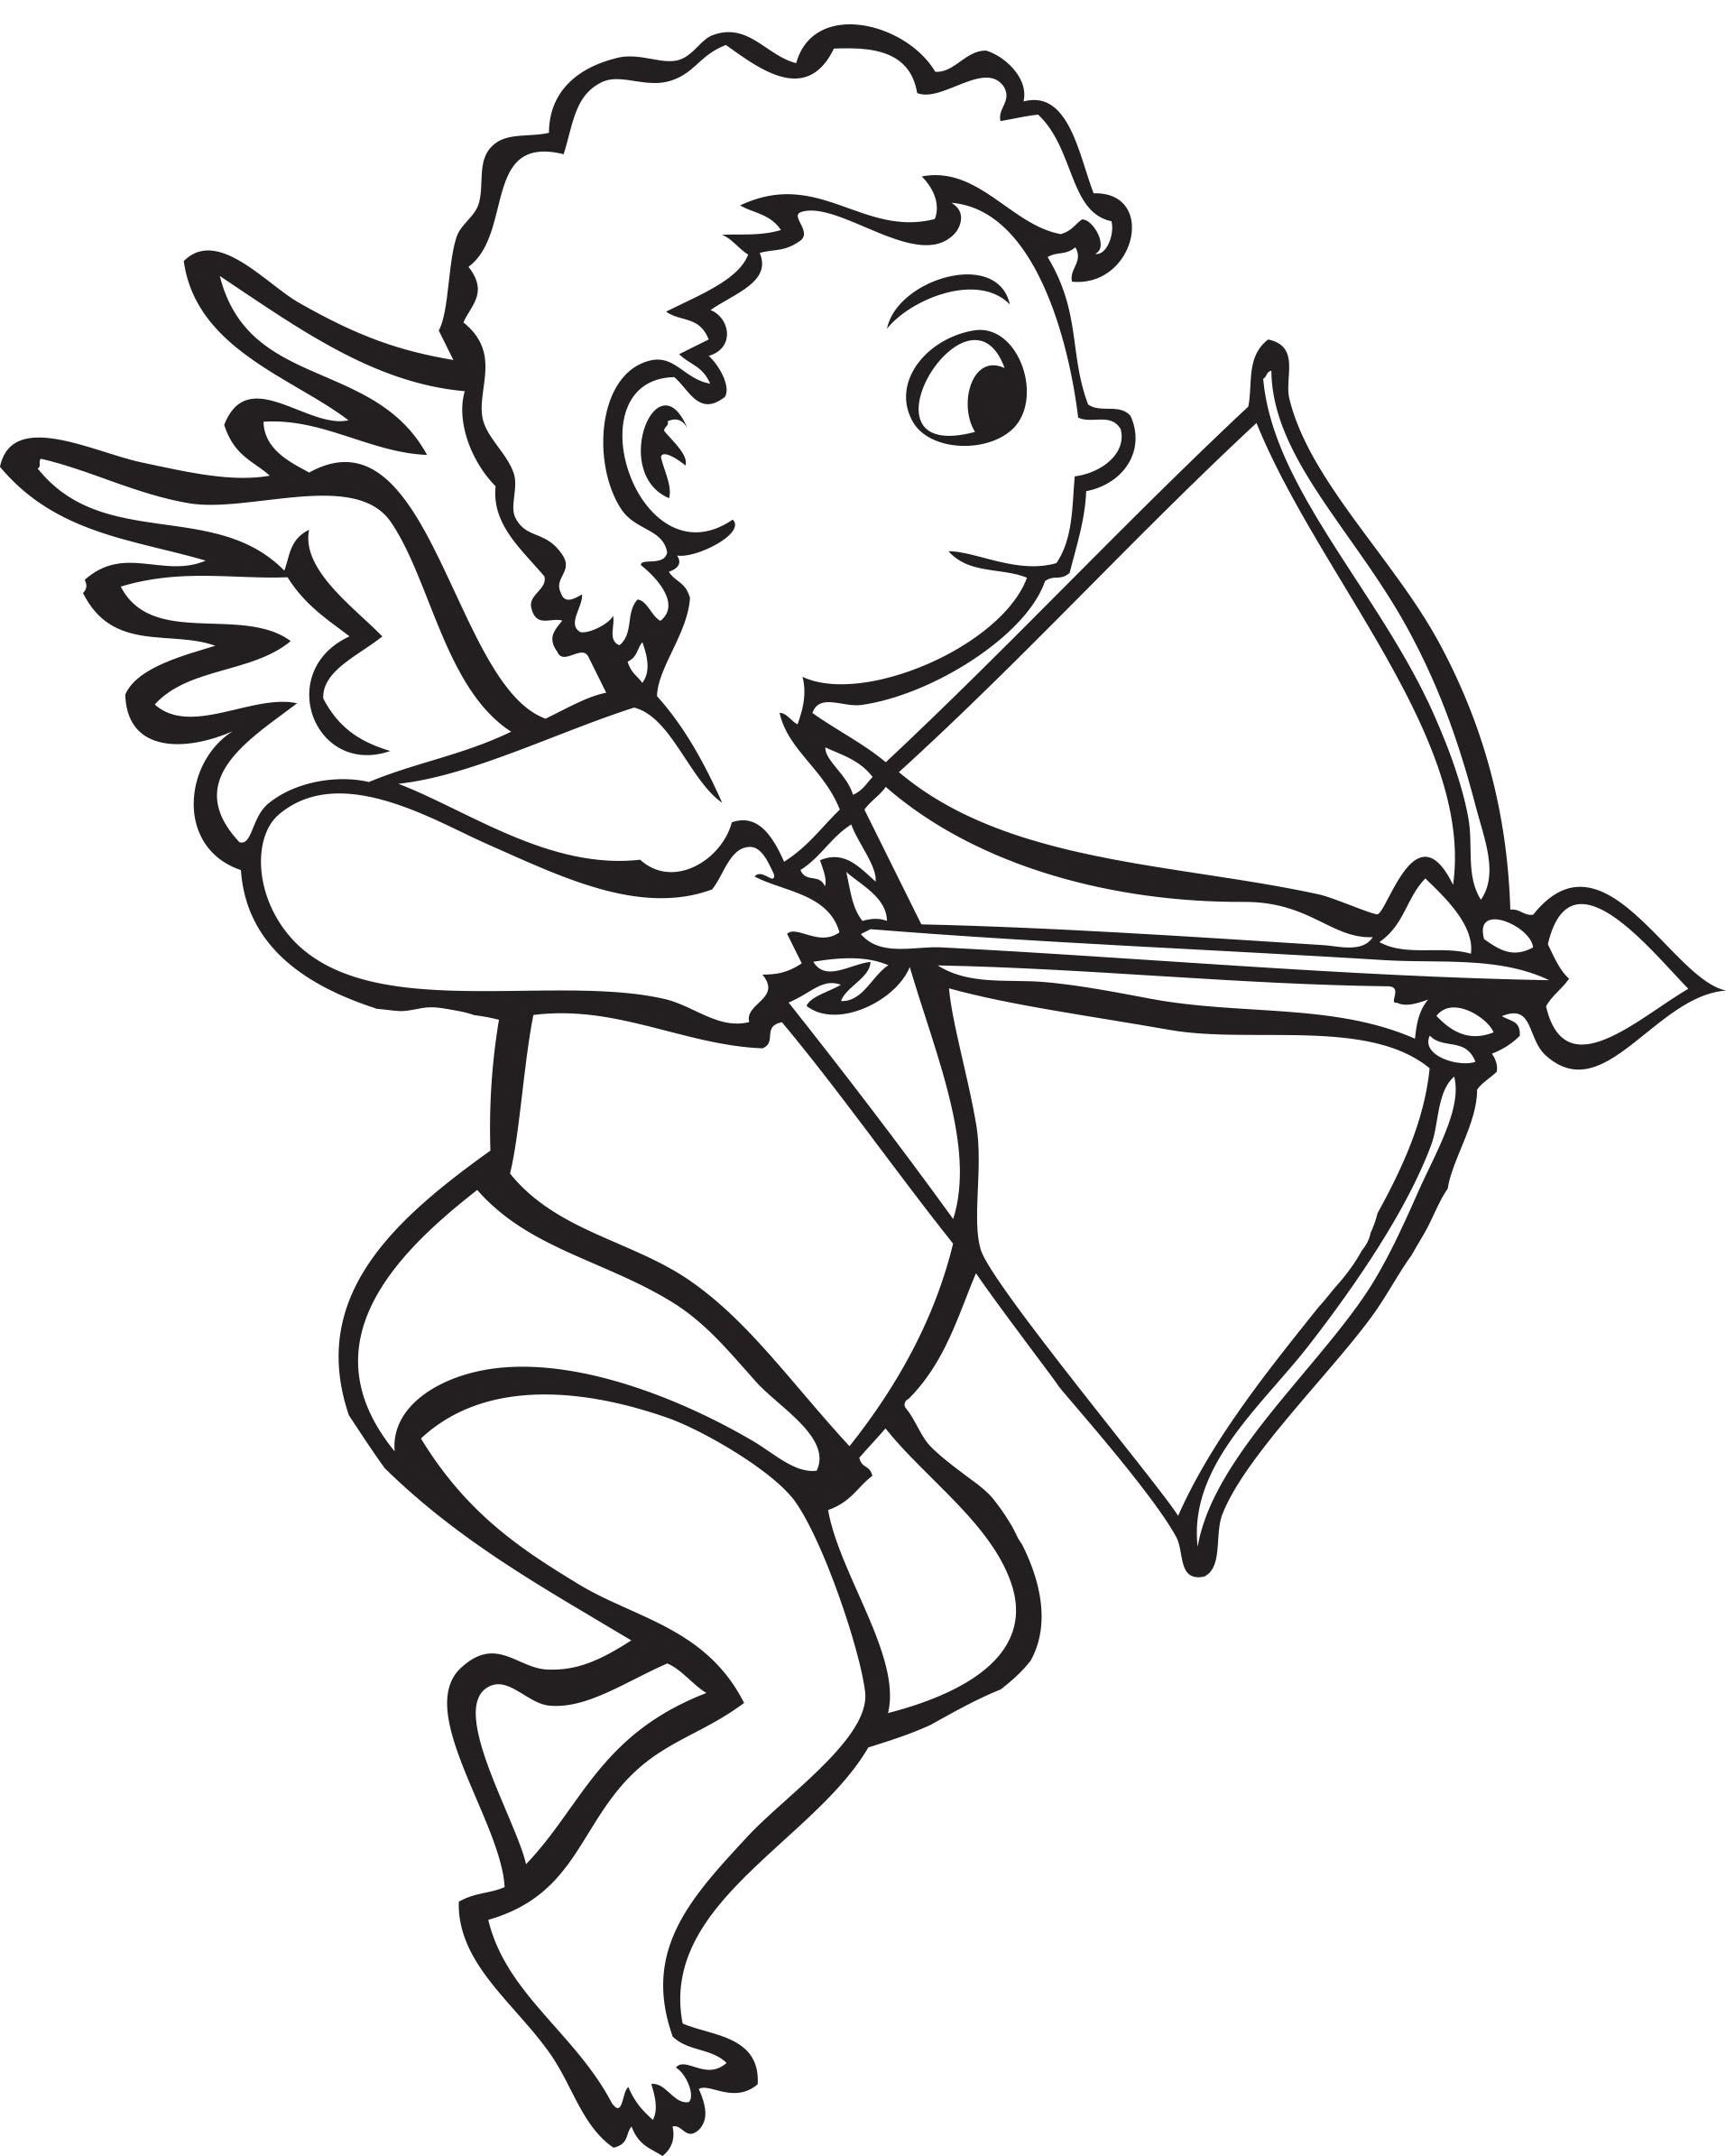 hight resolution of cupid arrow black clipart black